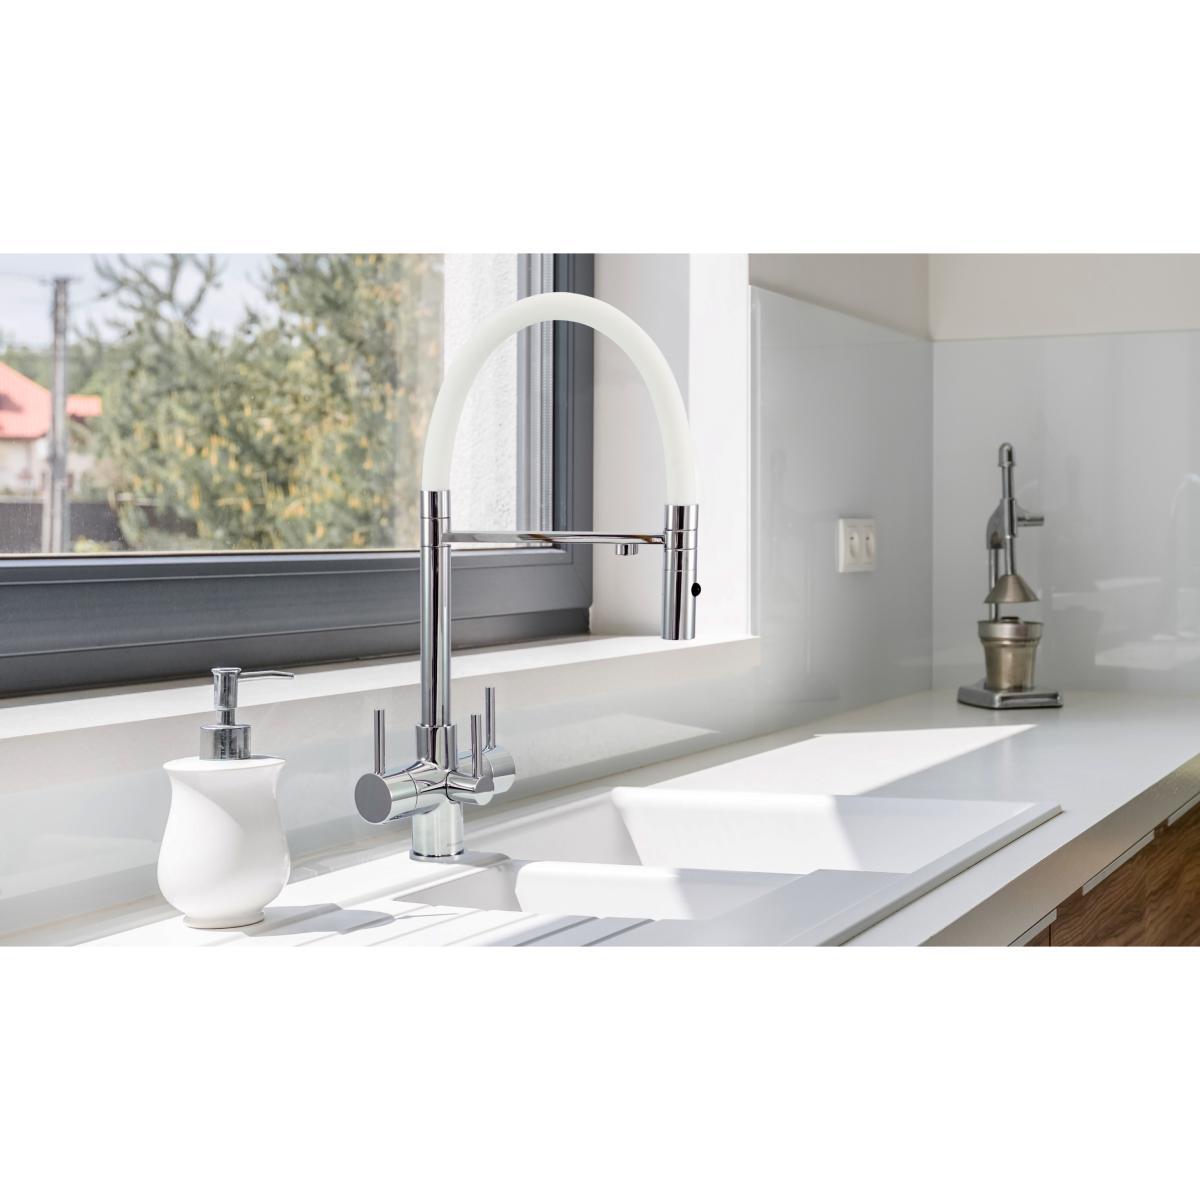 Acquapuro Aquila 3-Way 3 Lever Spray Kitchen Filter Tap White & Chrome